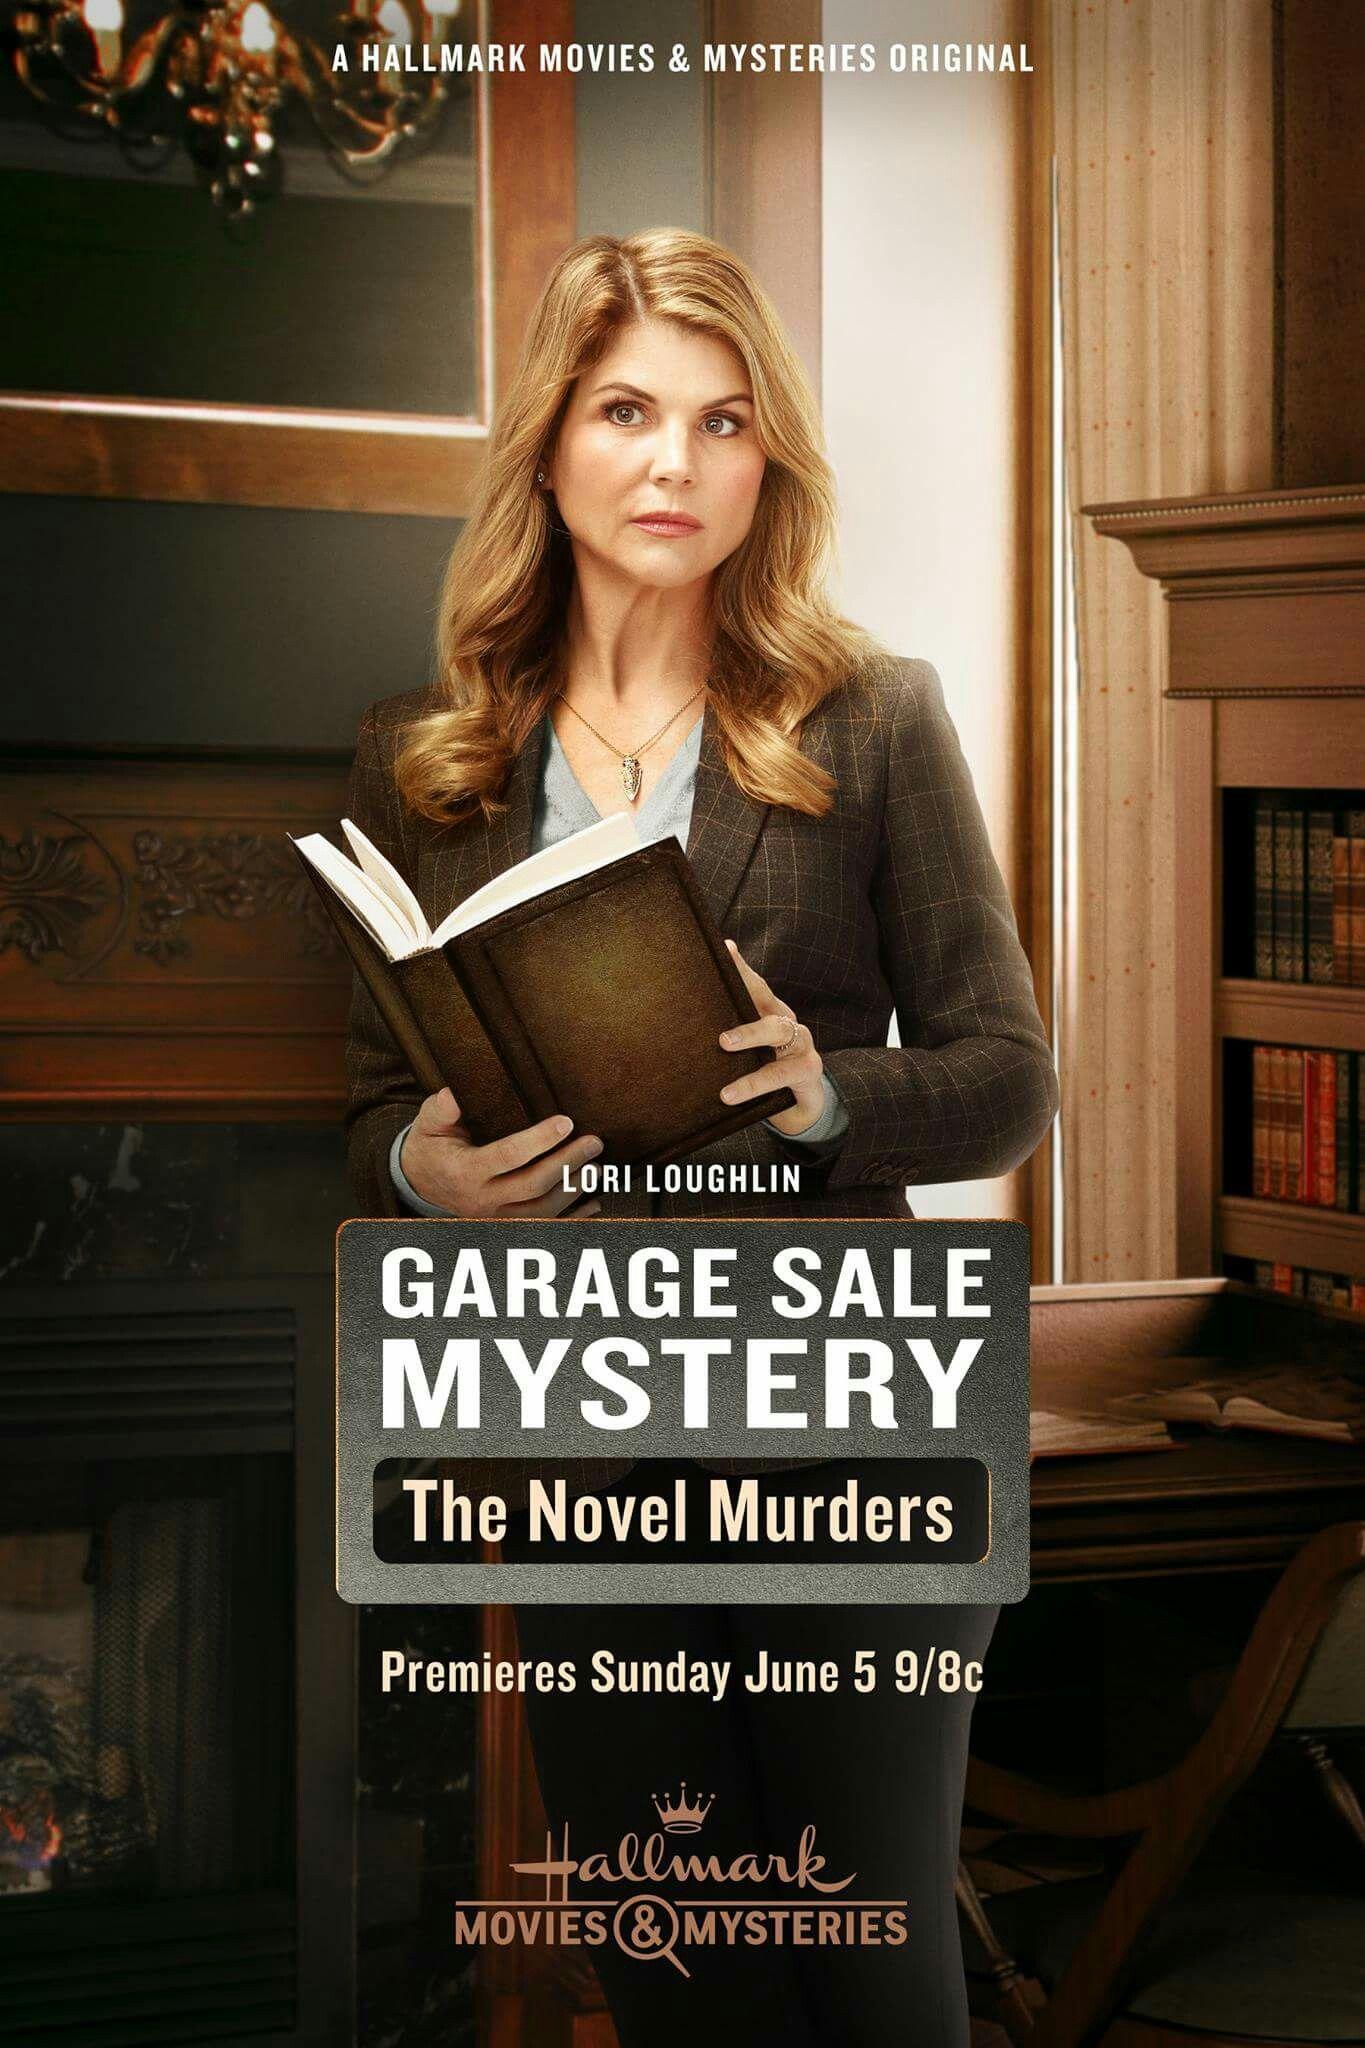 Pin By Lorie Ortiz On Garage Sale Mystery Hallmark Movies Garage Sale Mystery Hallmark Mysteries